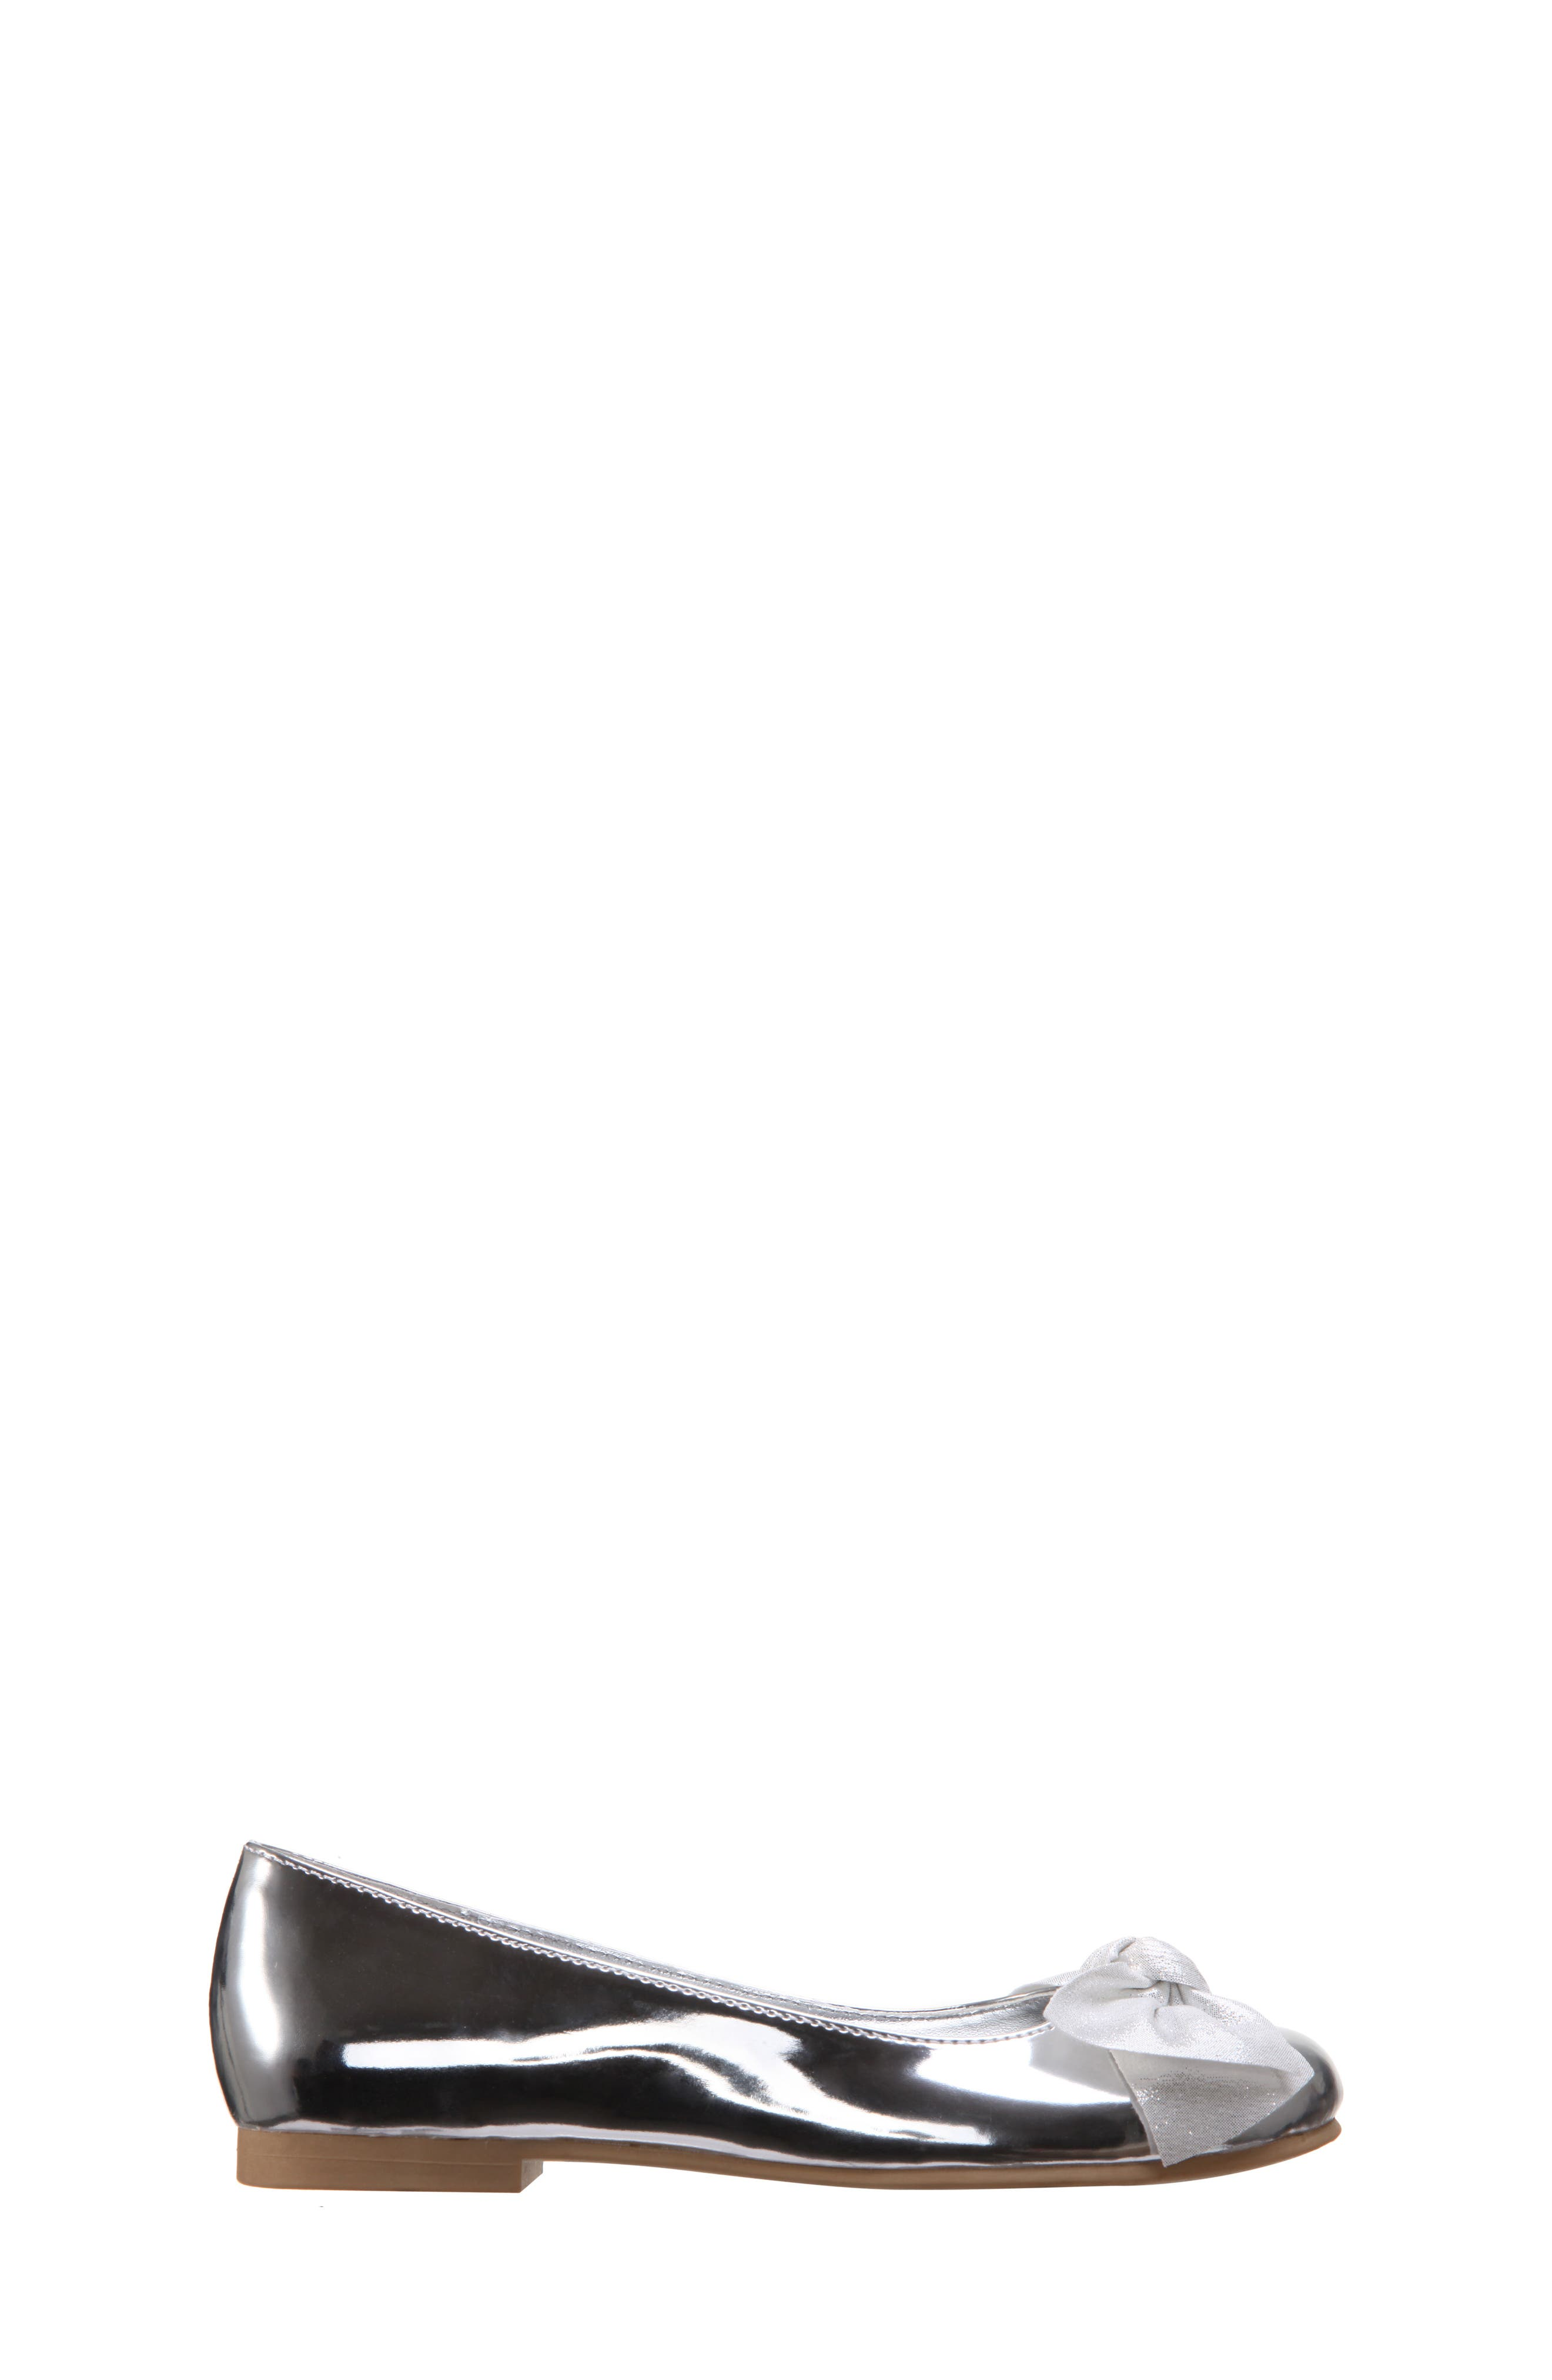 Katelyn Glitter Bow Metallic Ballet Flat,                             Alternate thumbnail 3, color,                             048